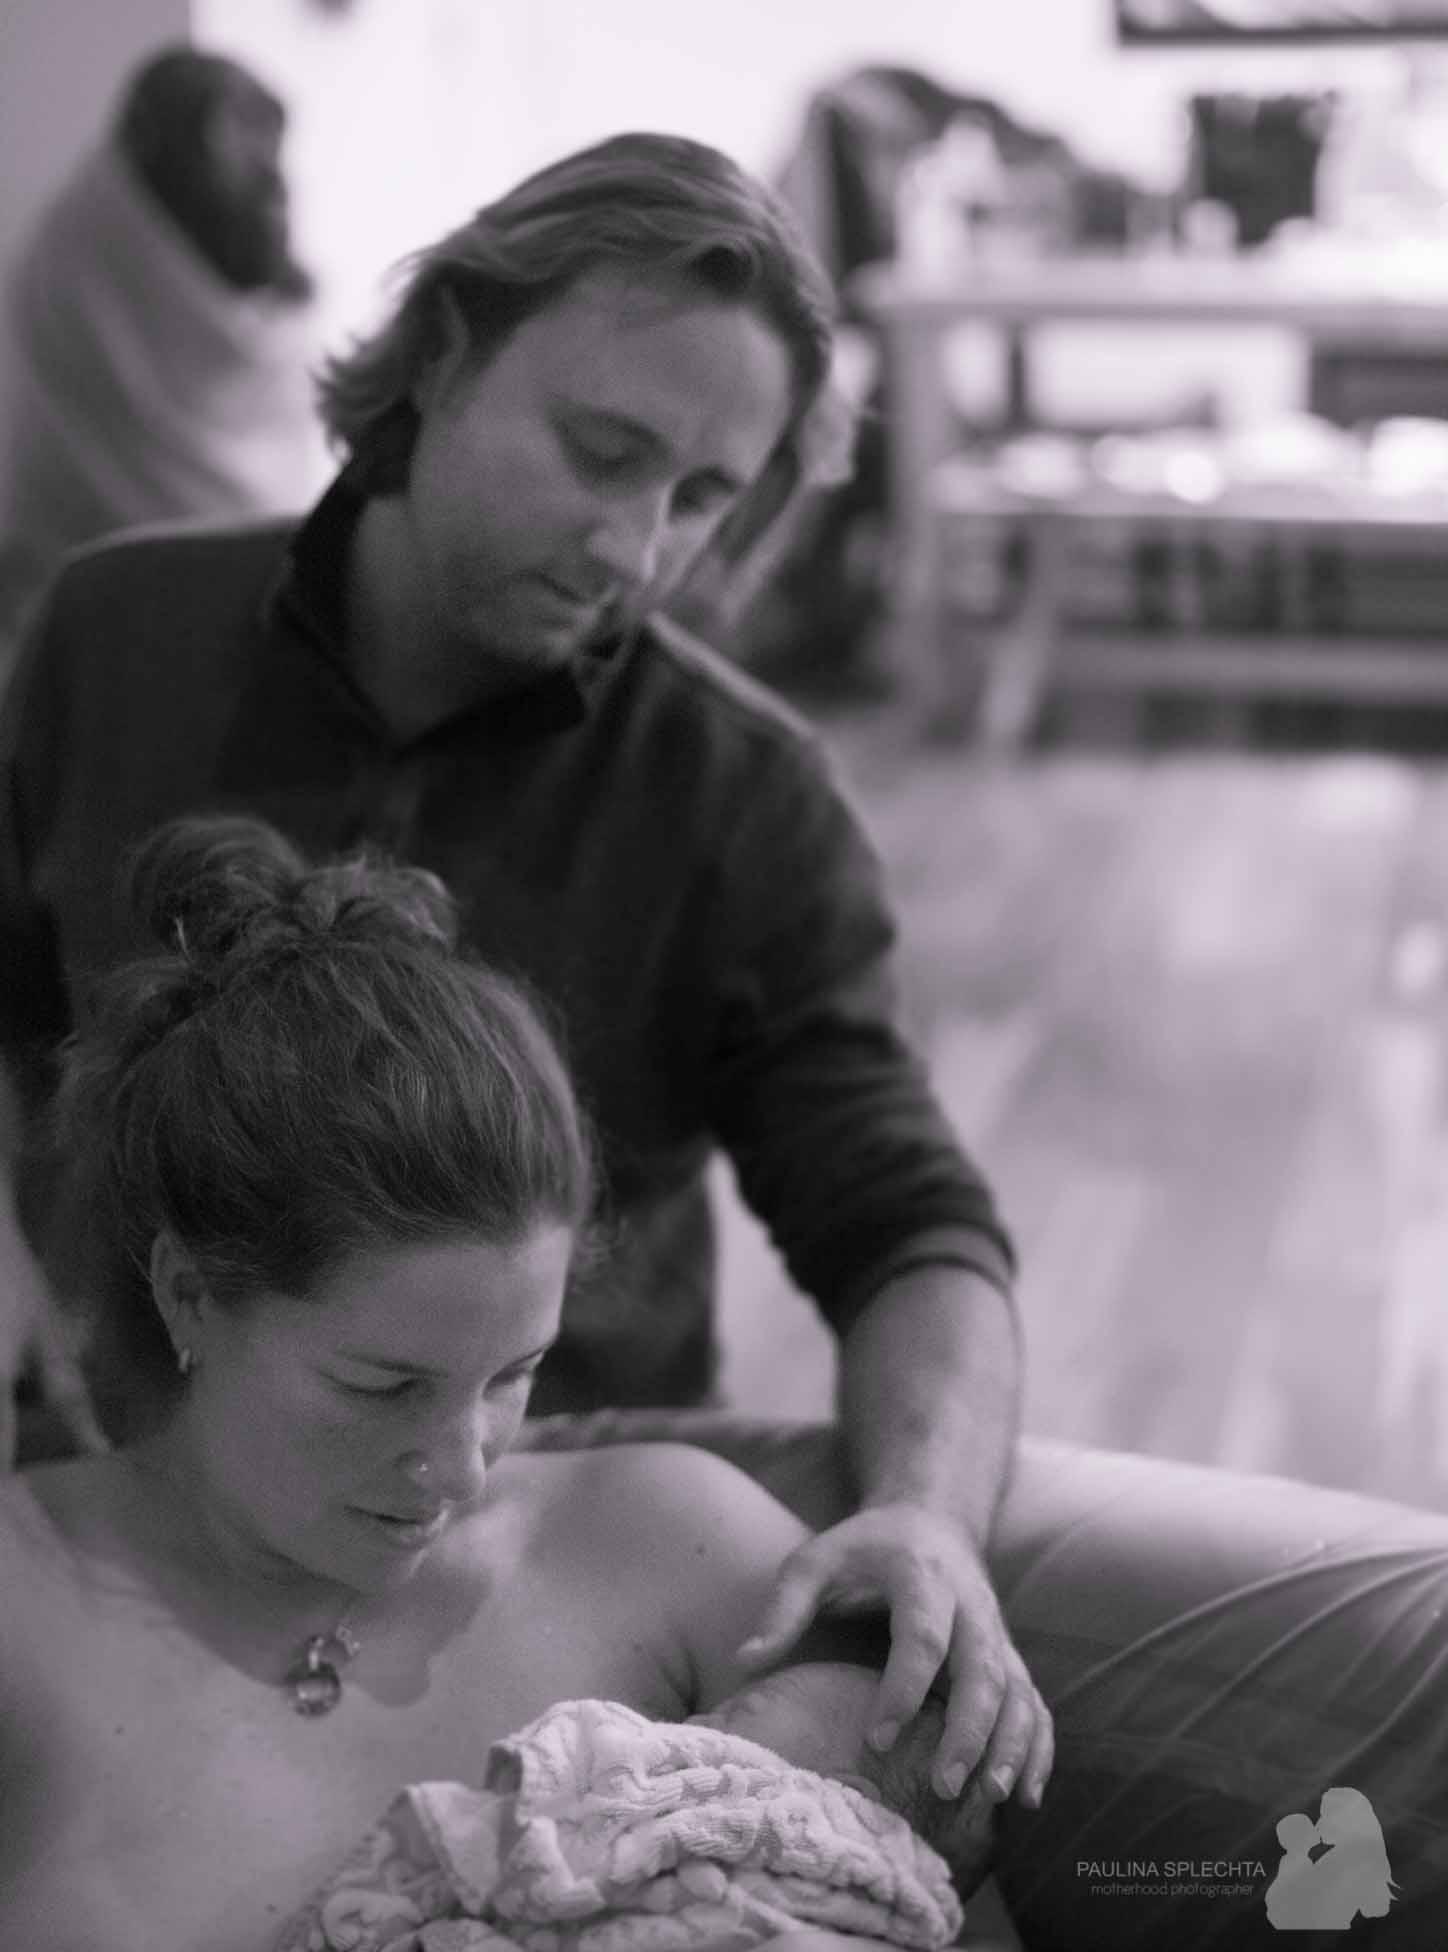 birth-photographer-boca-photography-near-me-birth-center-delray-beach-hollywood-breastfeeding-doula-midwife-childbirth-25.jpg